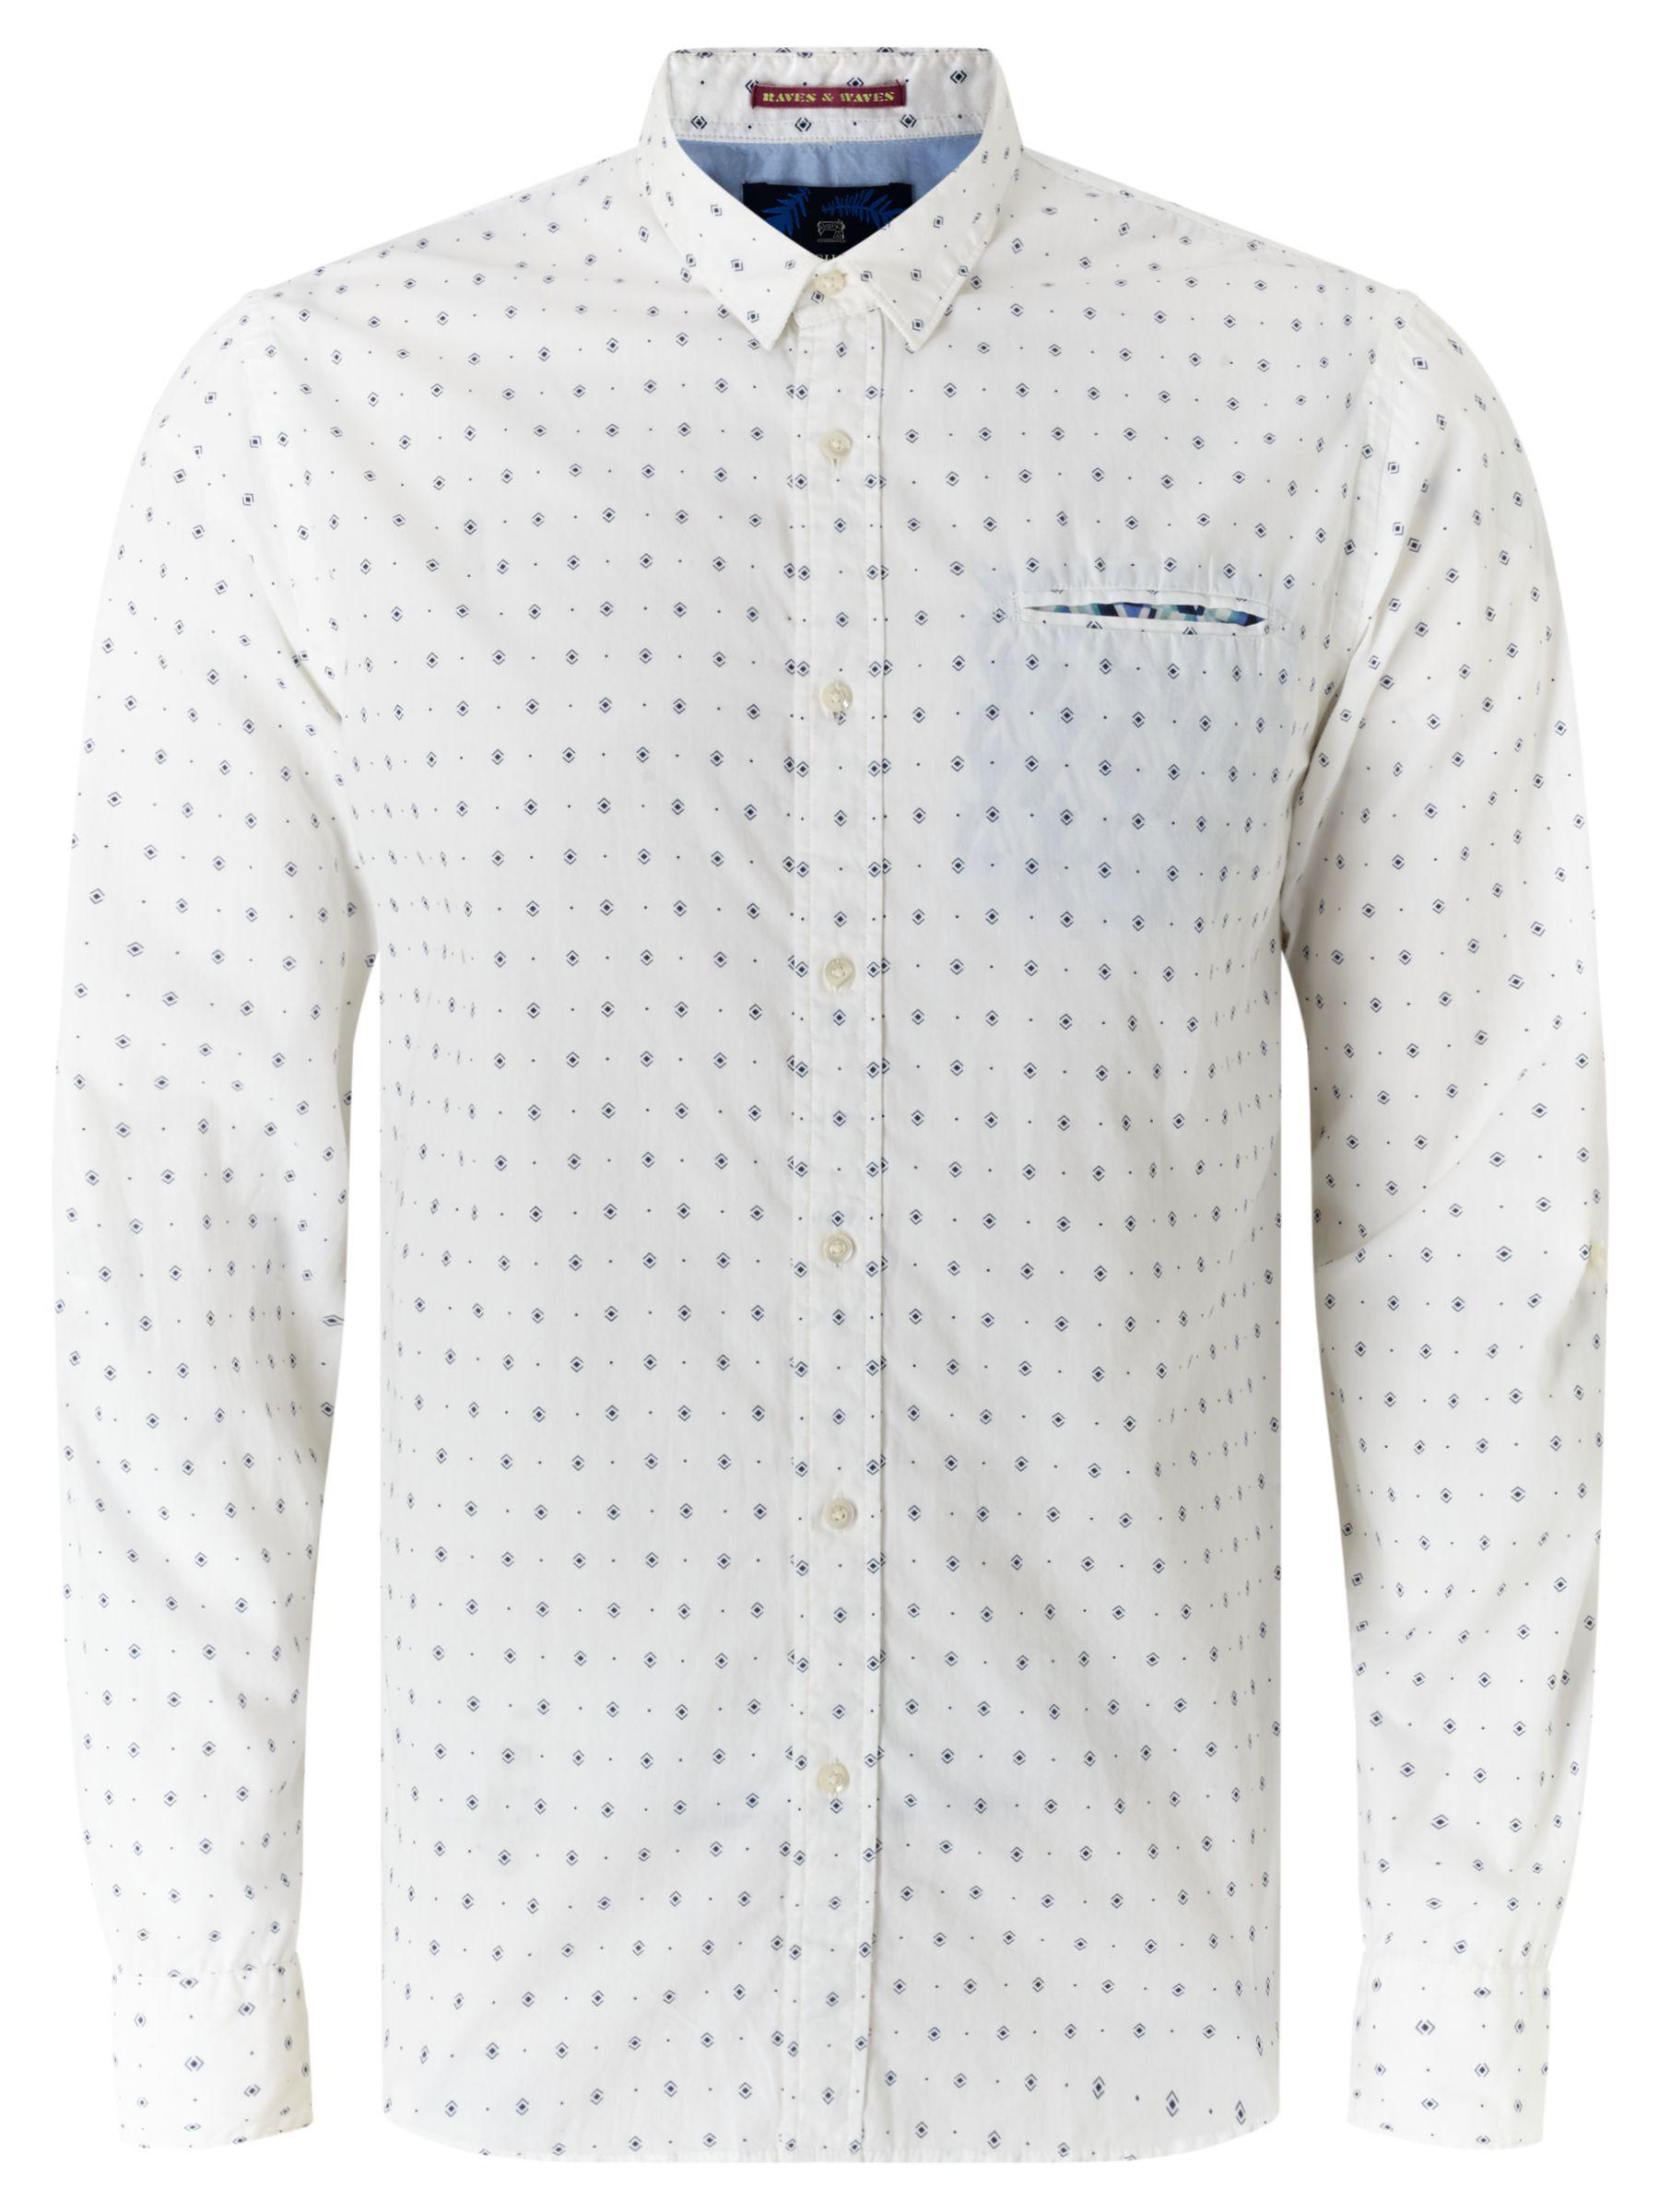 Scotch & Soda Scotch & Soda Long Sleeve Fixed Pochet Shirt, White